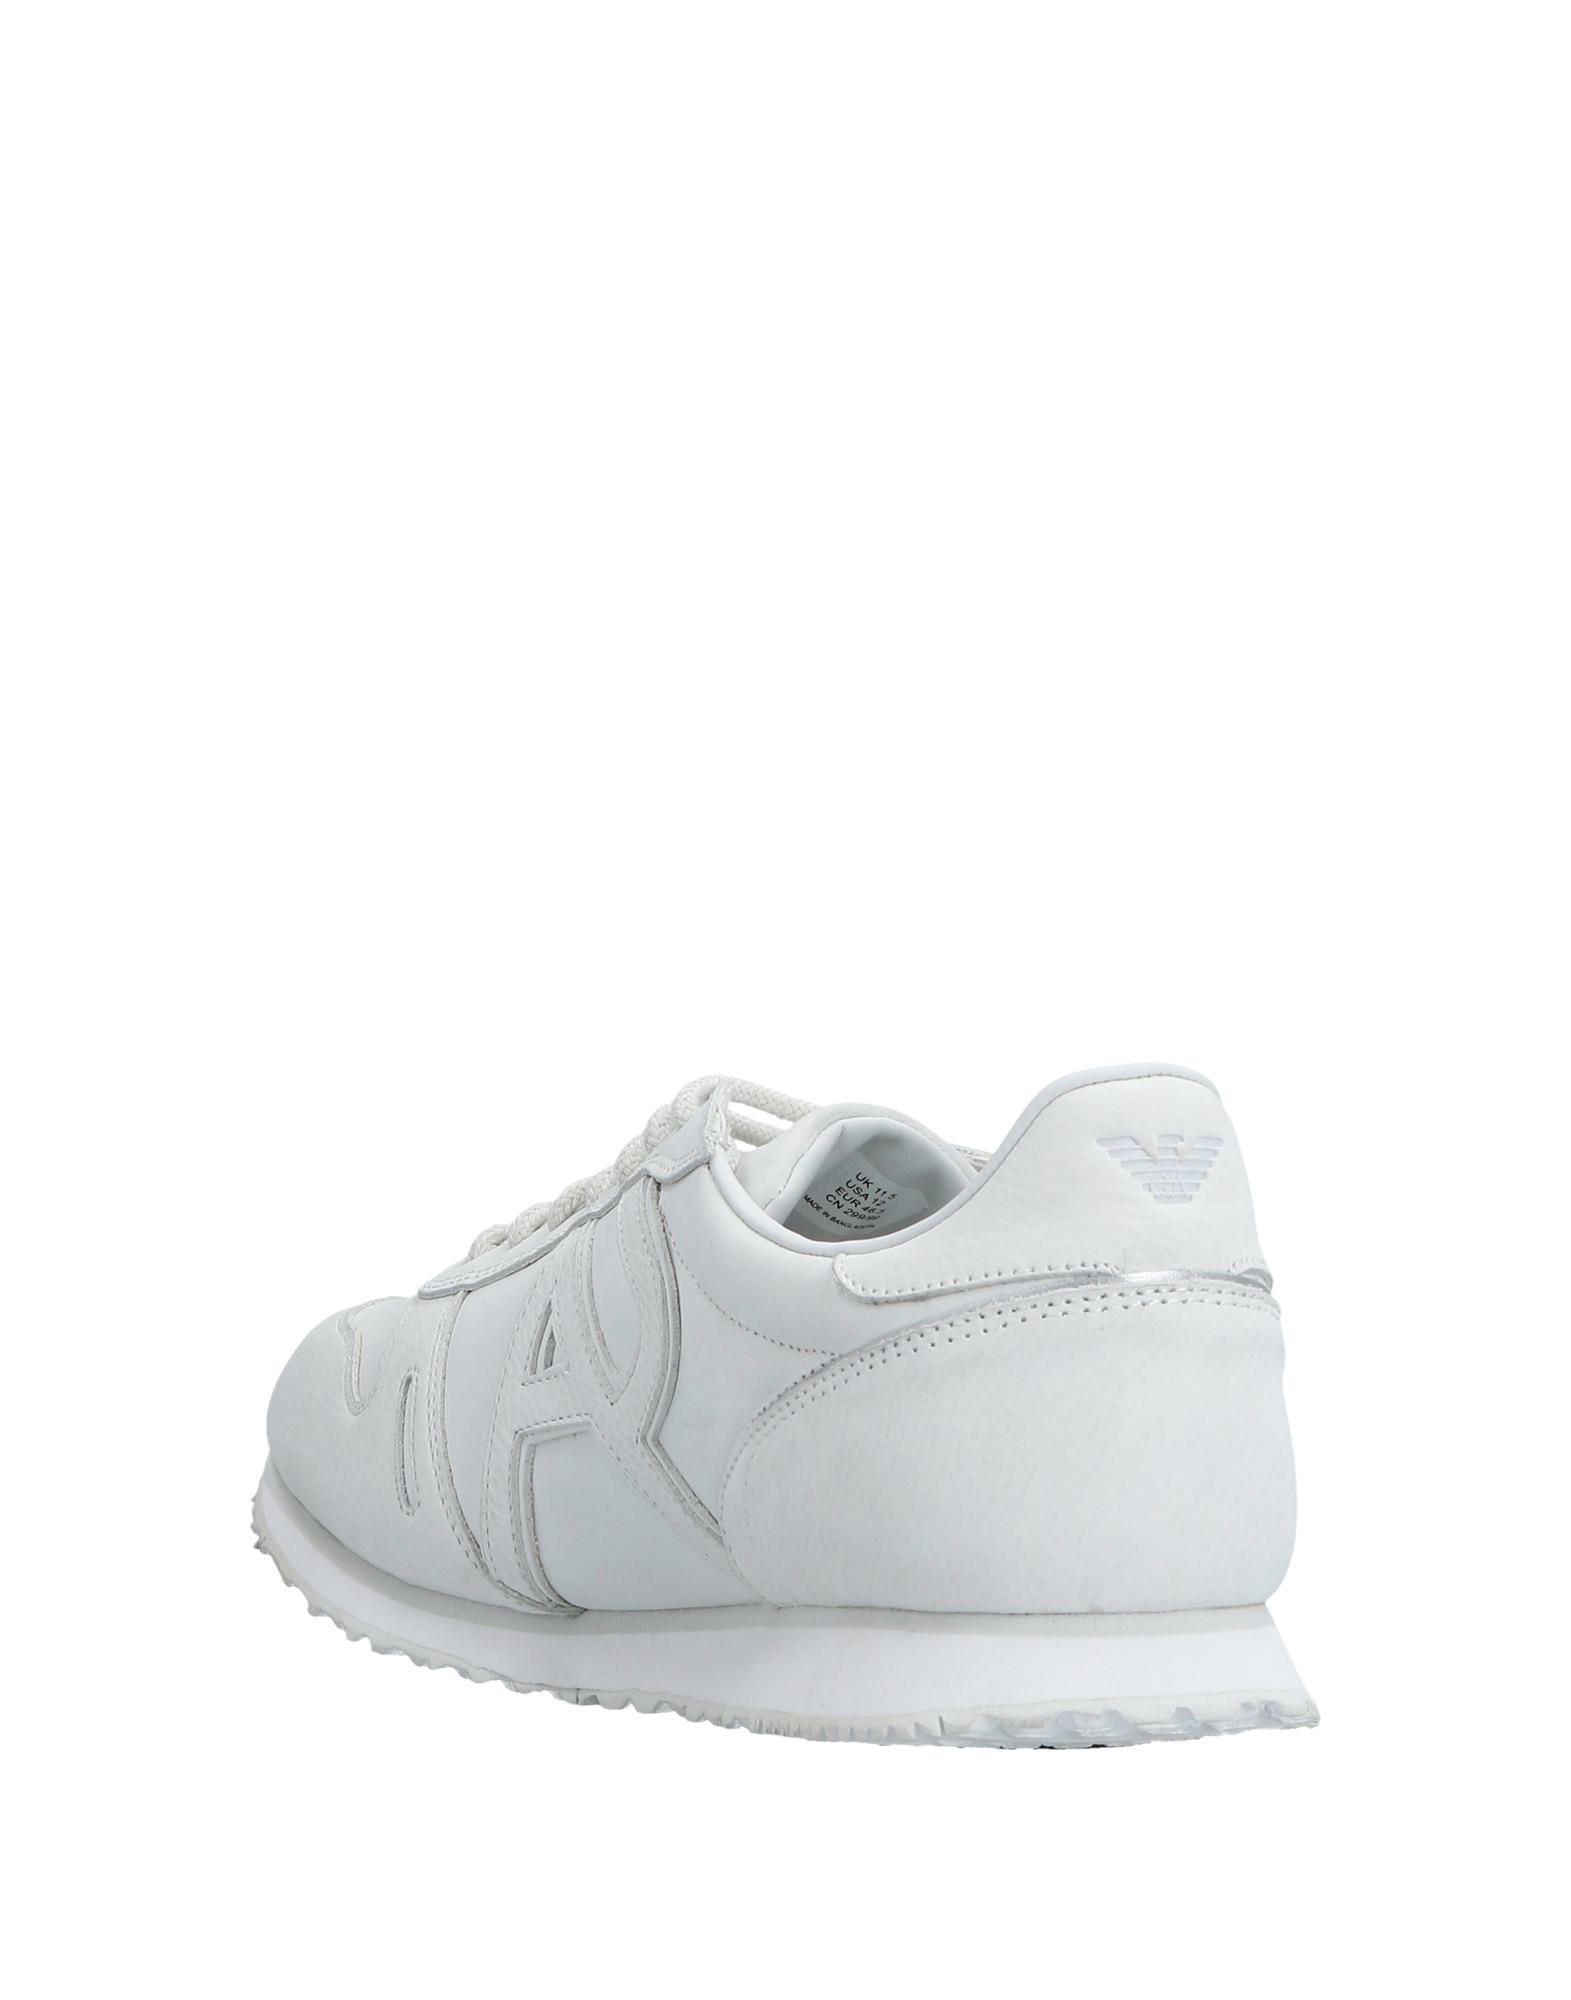 Rabatt echte Schuhe Armani 11527979PC Jeans Sneakers Herren  11527979PC Armani ace346